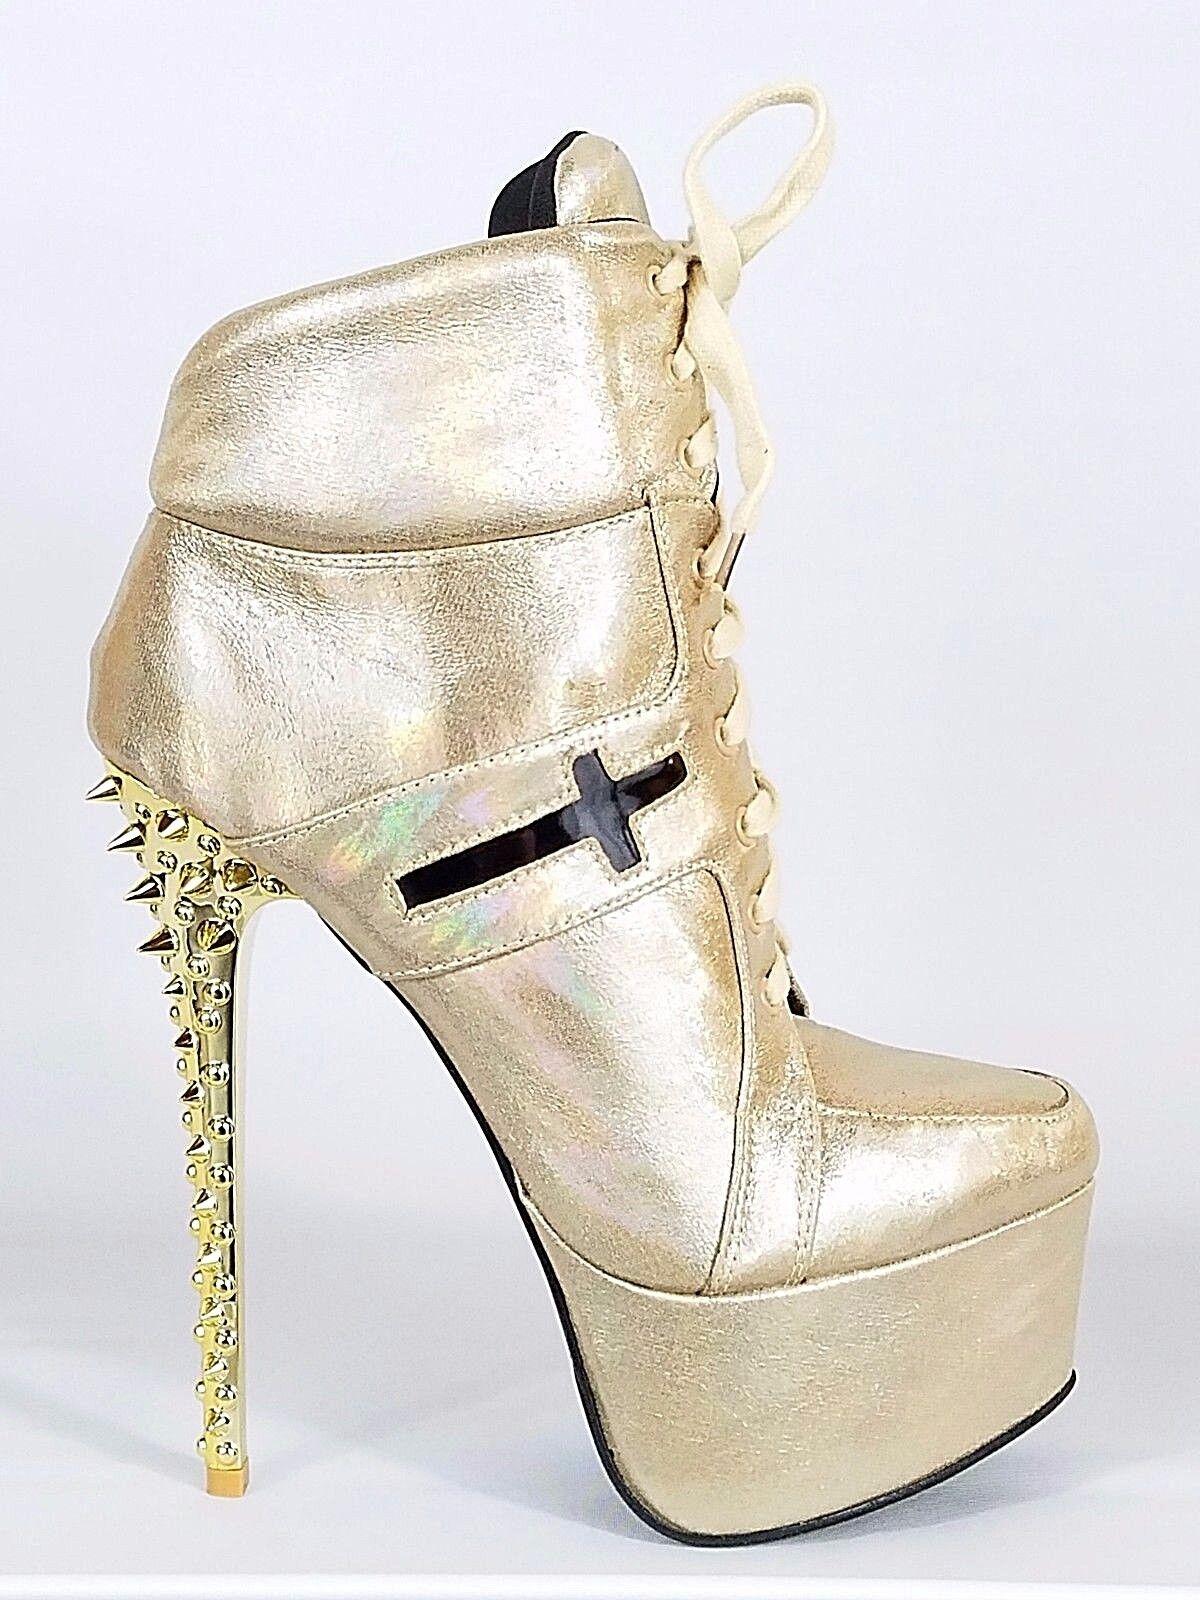 Mona Mia Anapaula gold Hologram Spiked Heel Platform Ankle Sneaker Boot 7-11